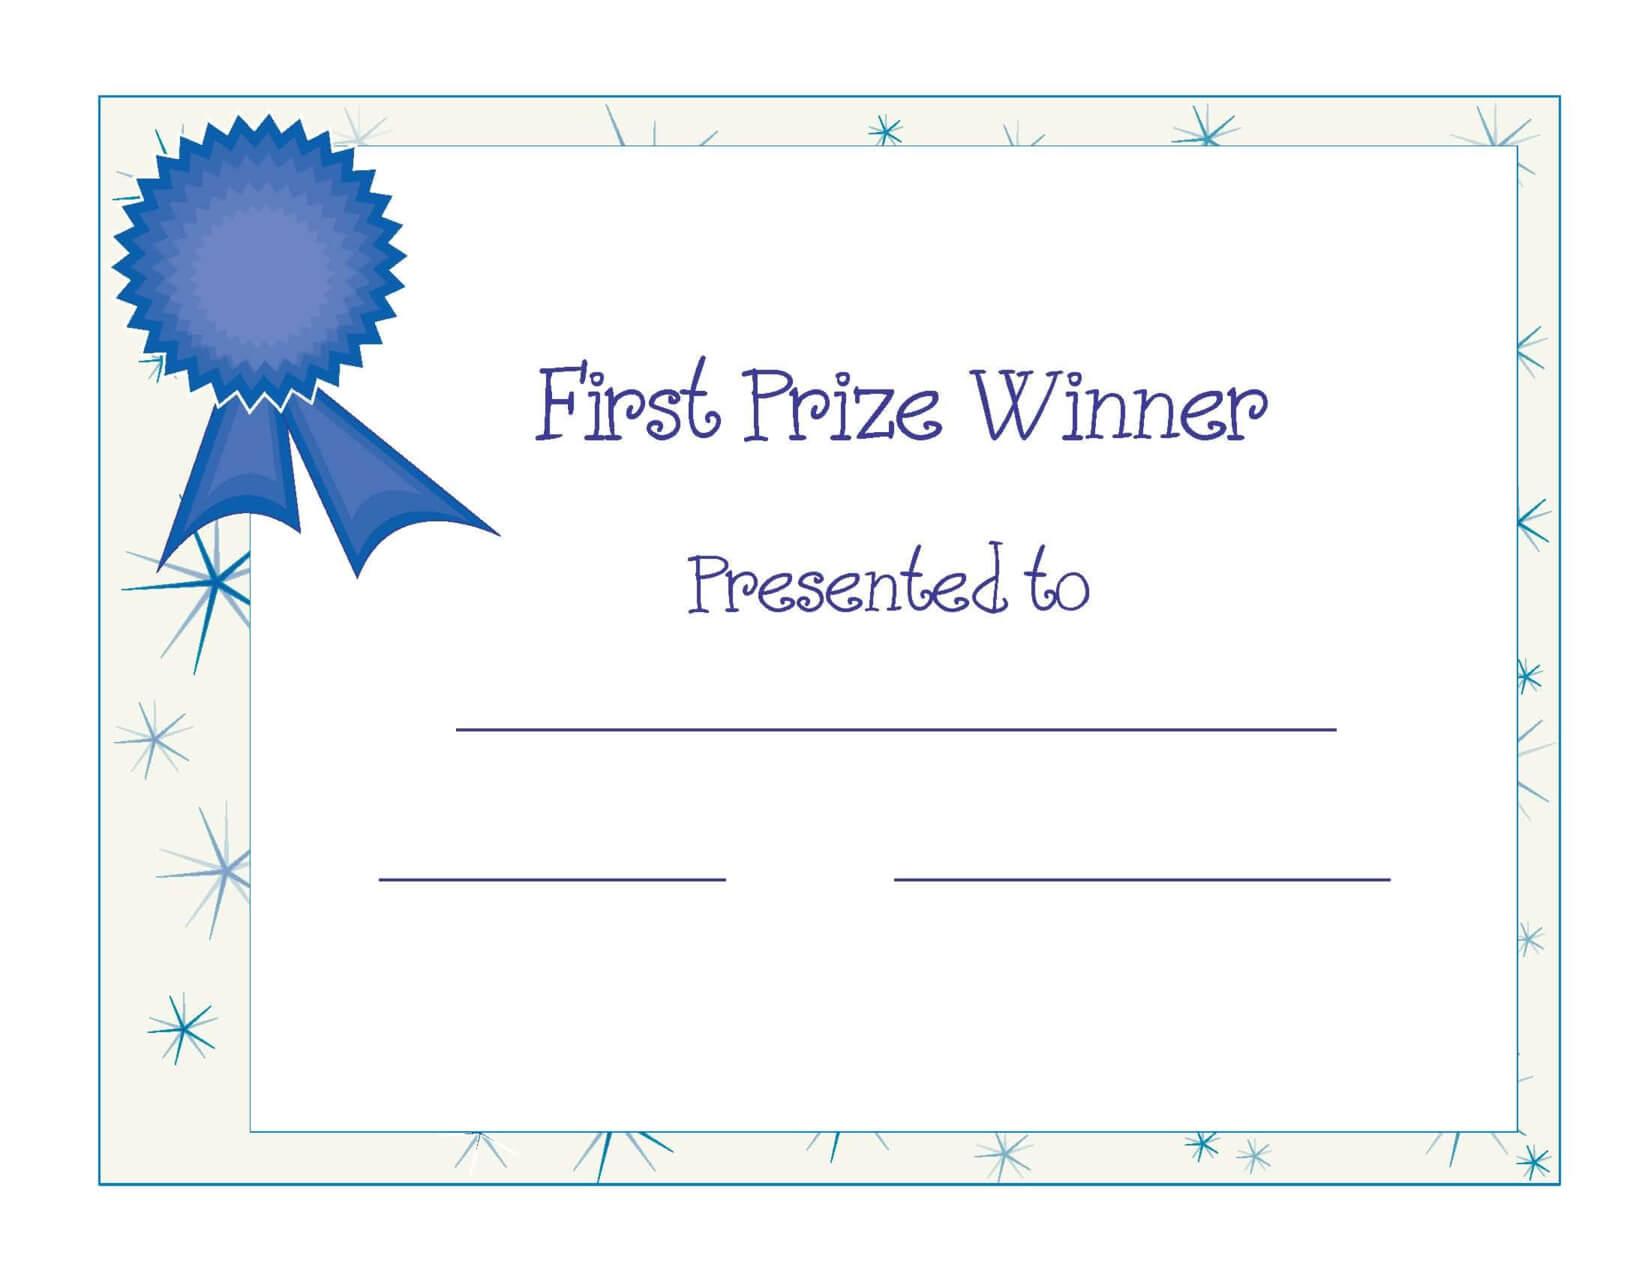 Free Printable Award Certificate Template | Free Printable In Free Printable Blank Award Certificate Templates